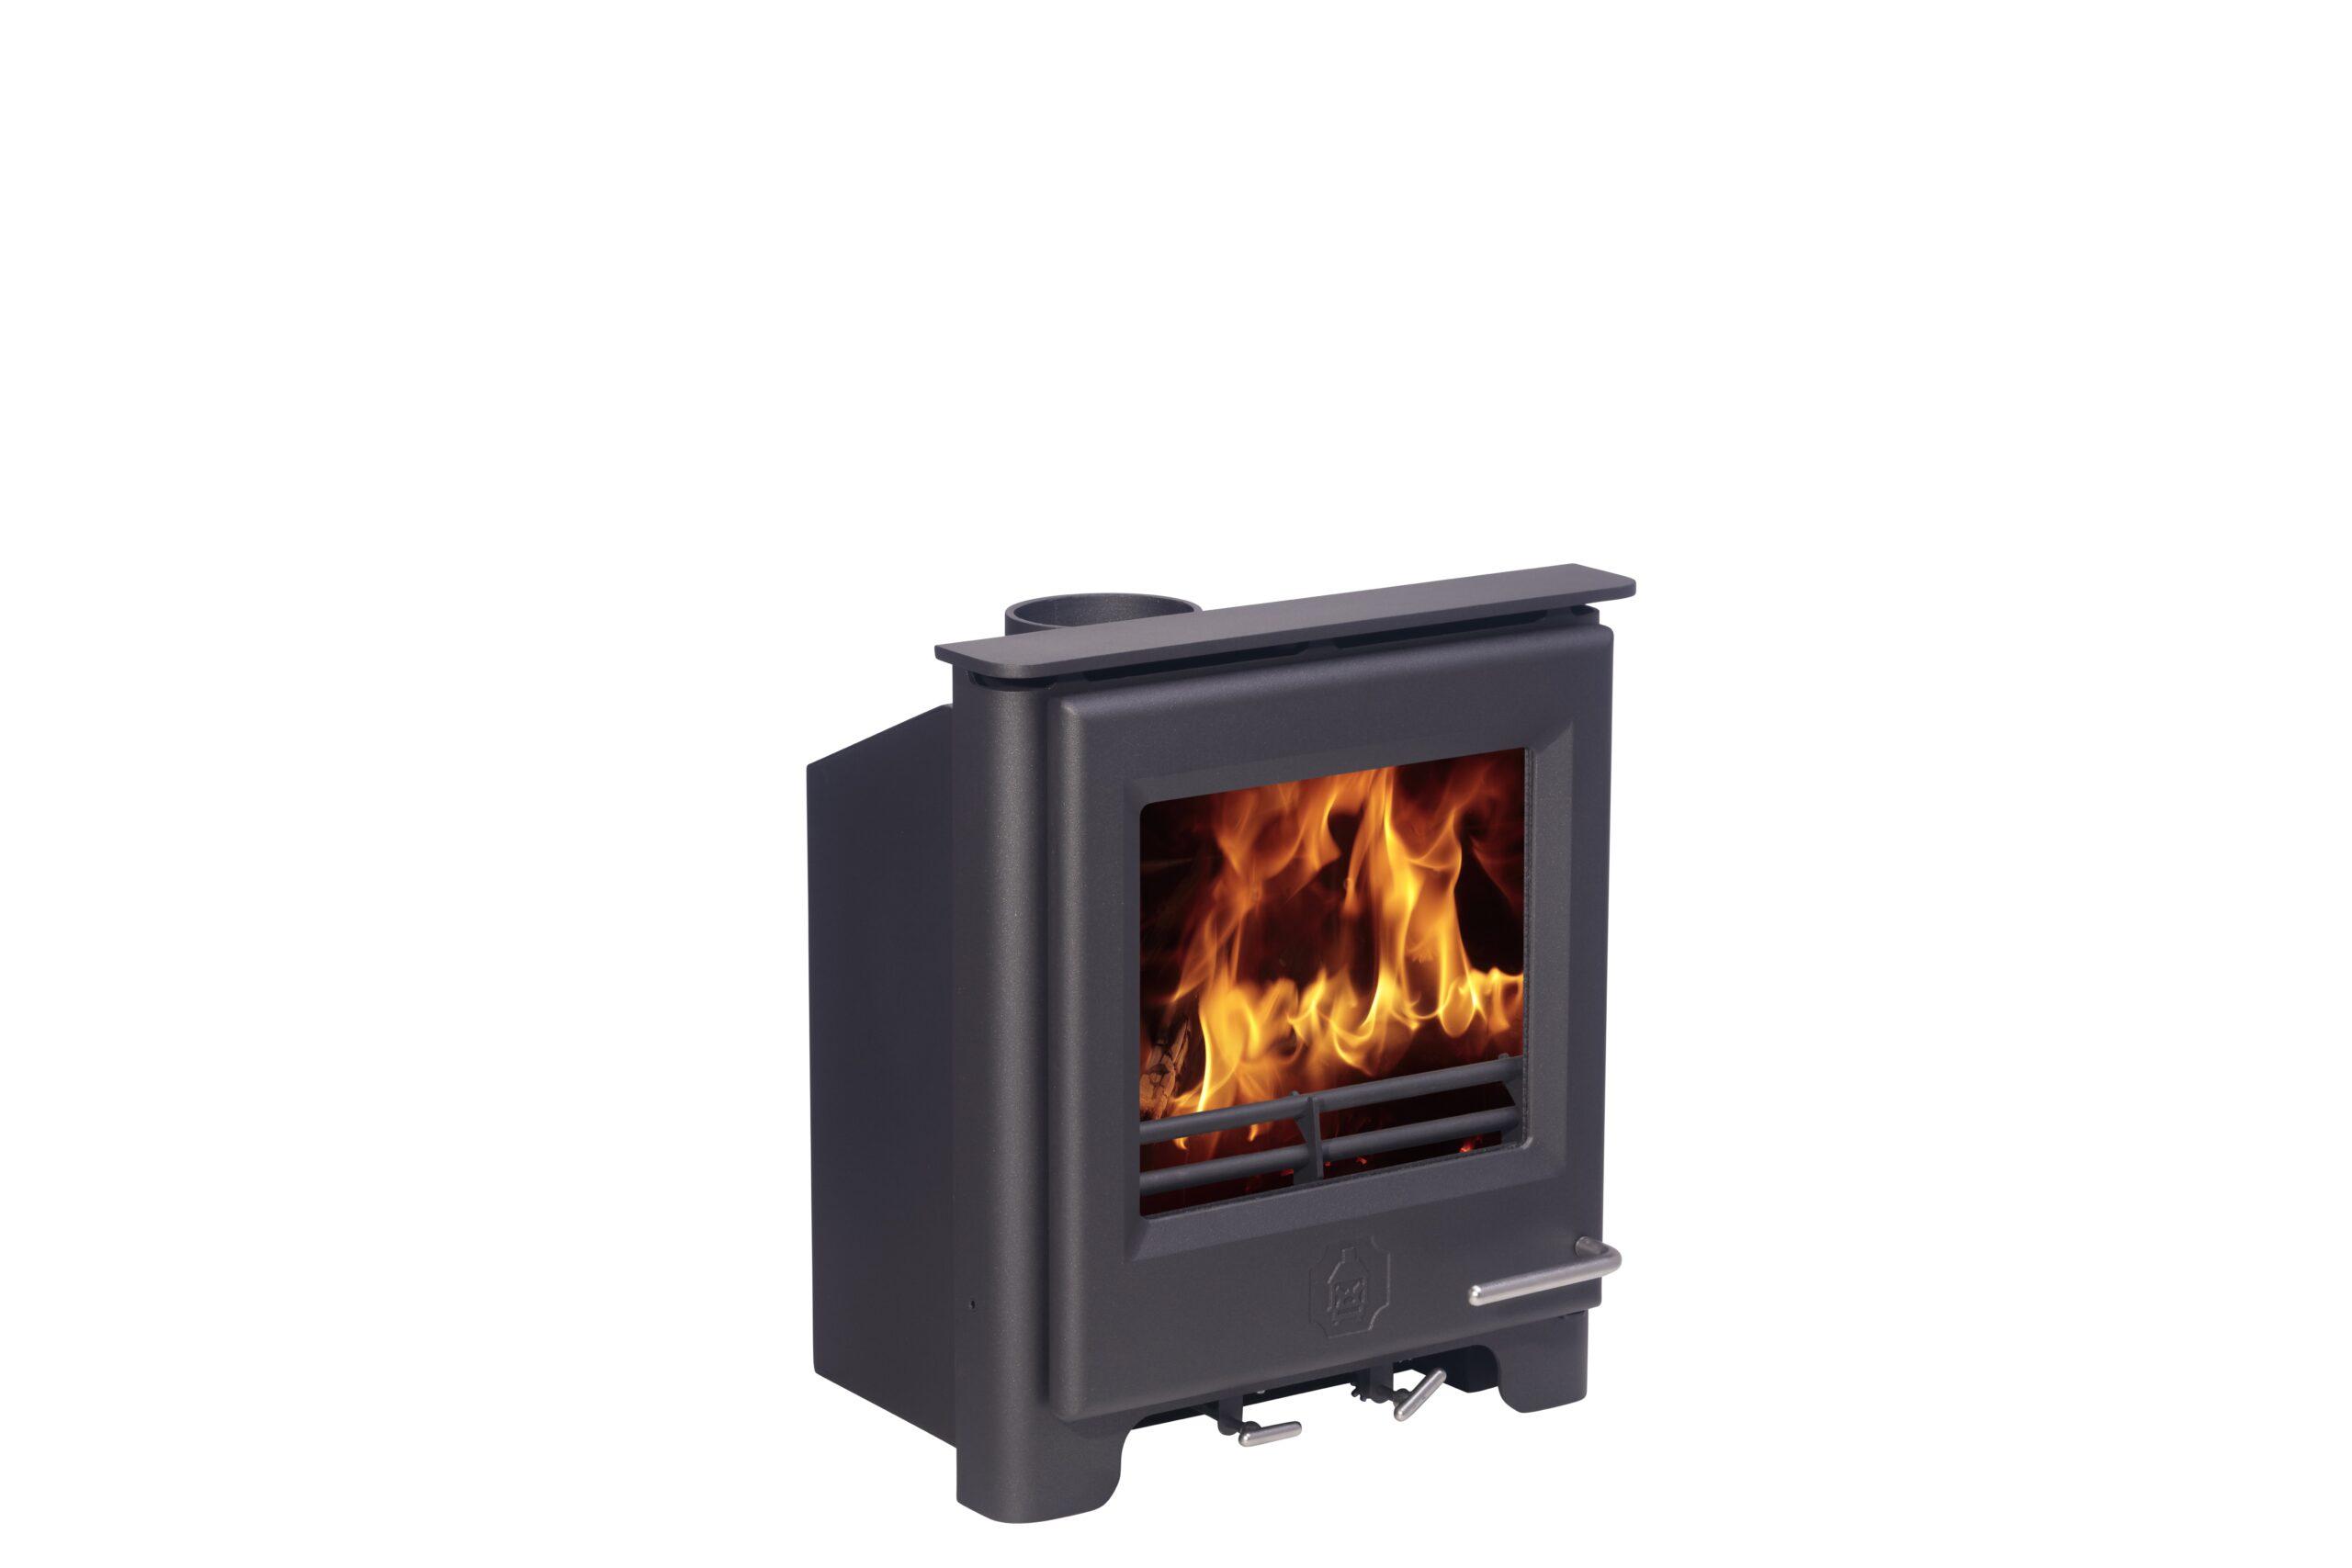 Phoenix Firebright Eco Inset Mineral Fuel